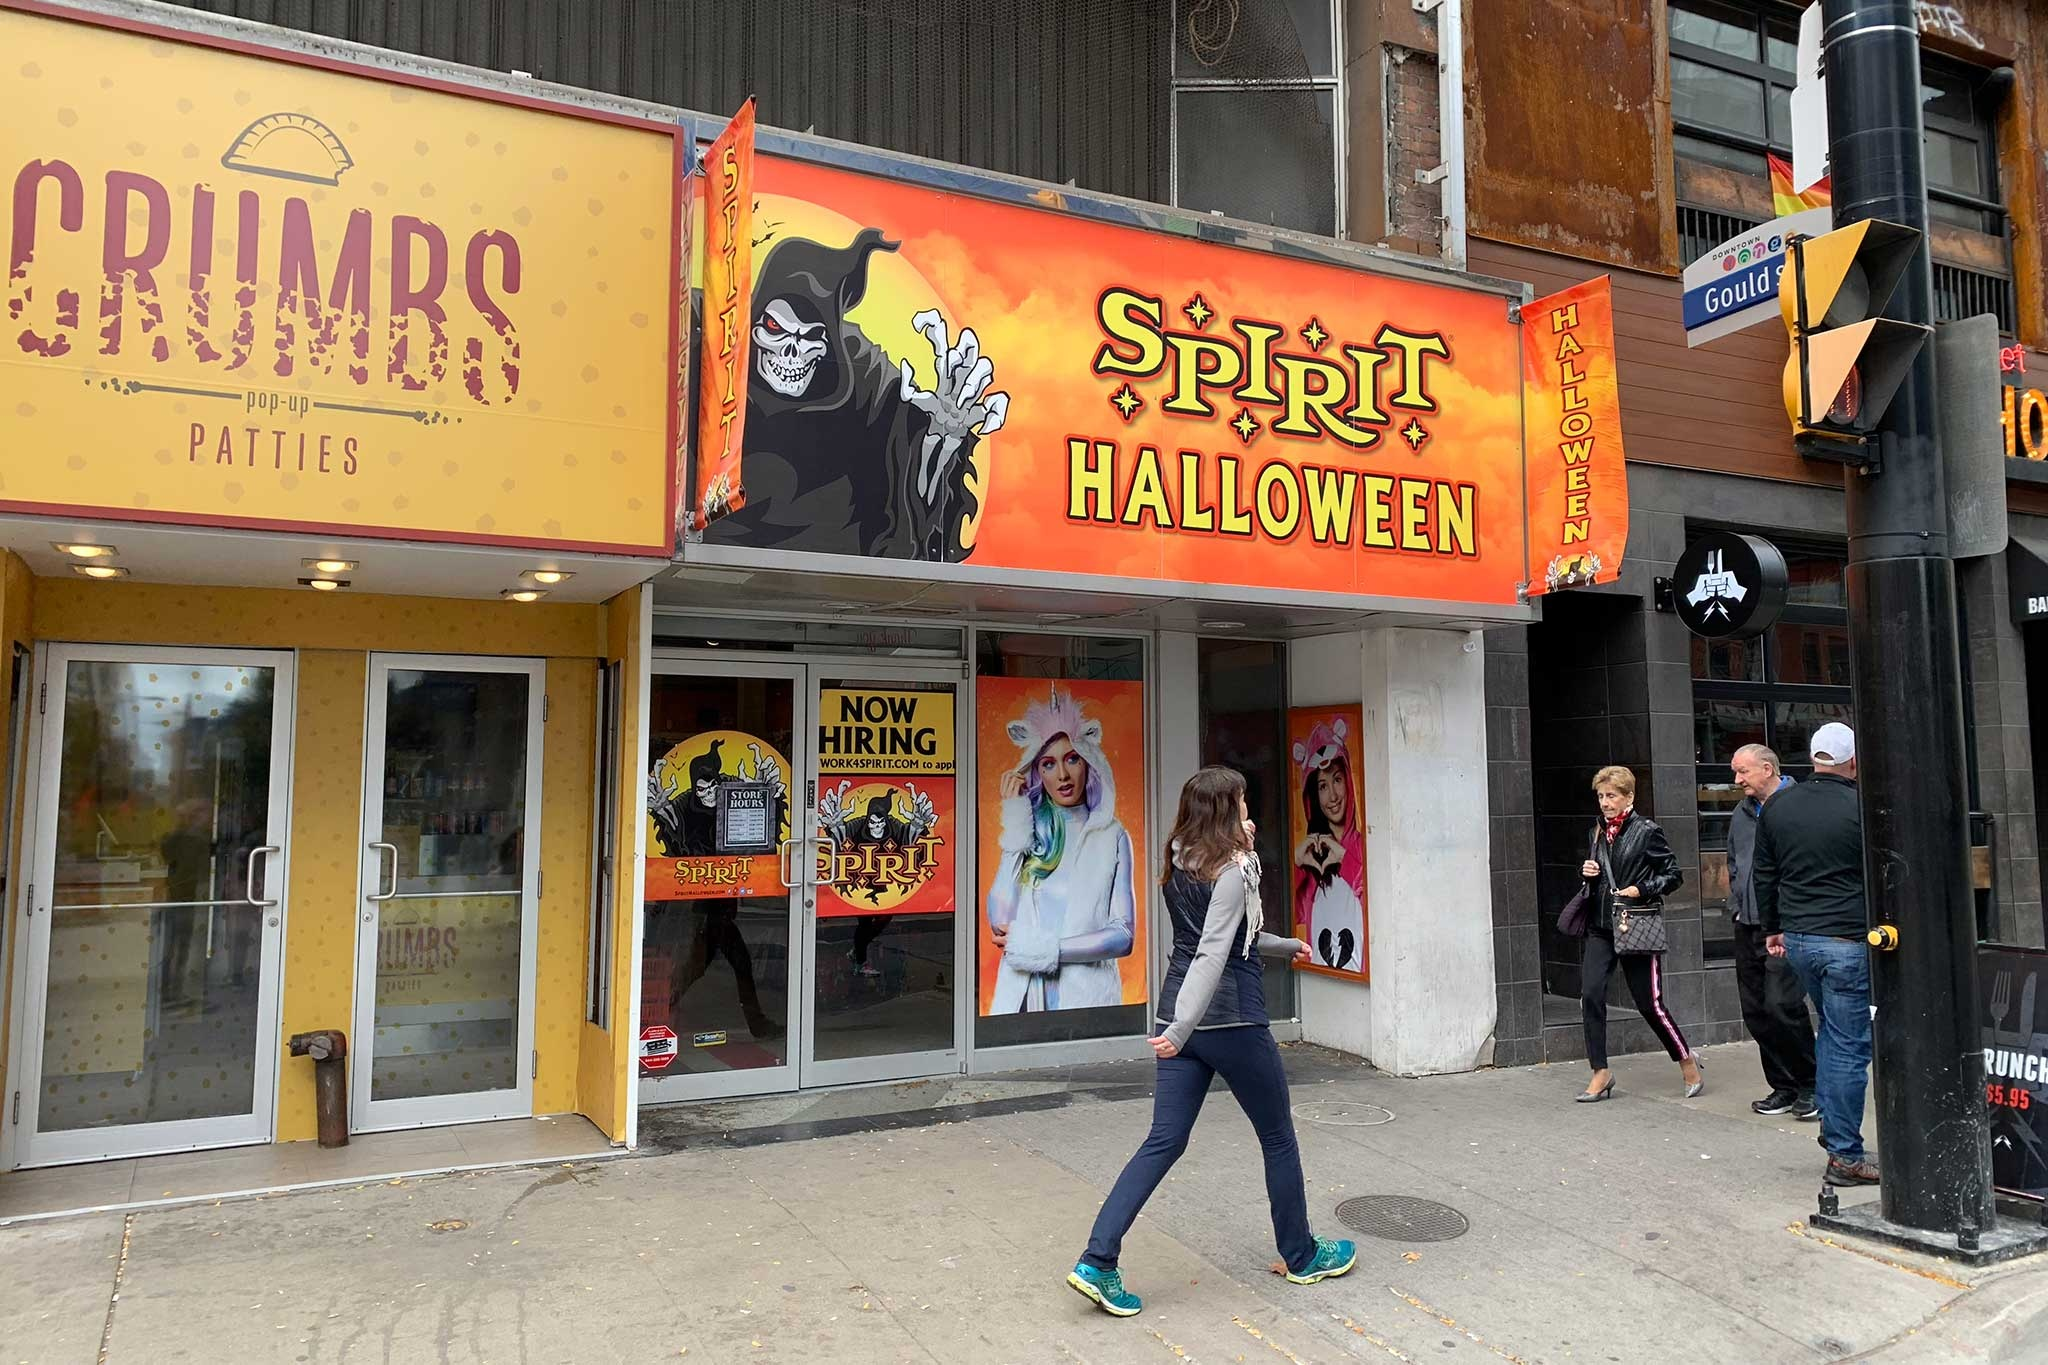 spirit halloween puts the hurt on toronto costume stores